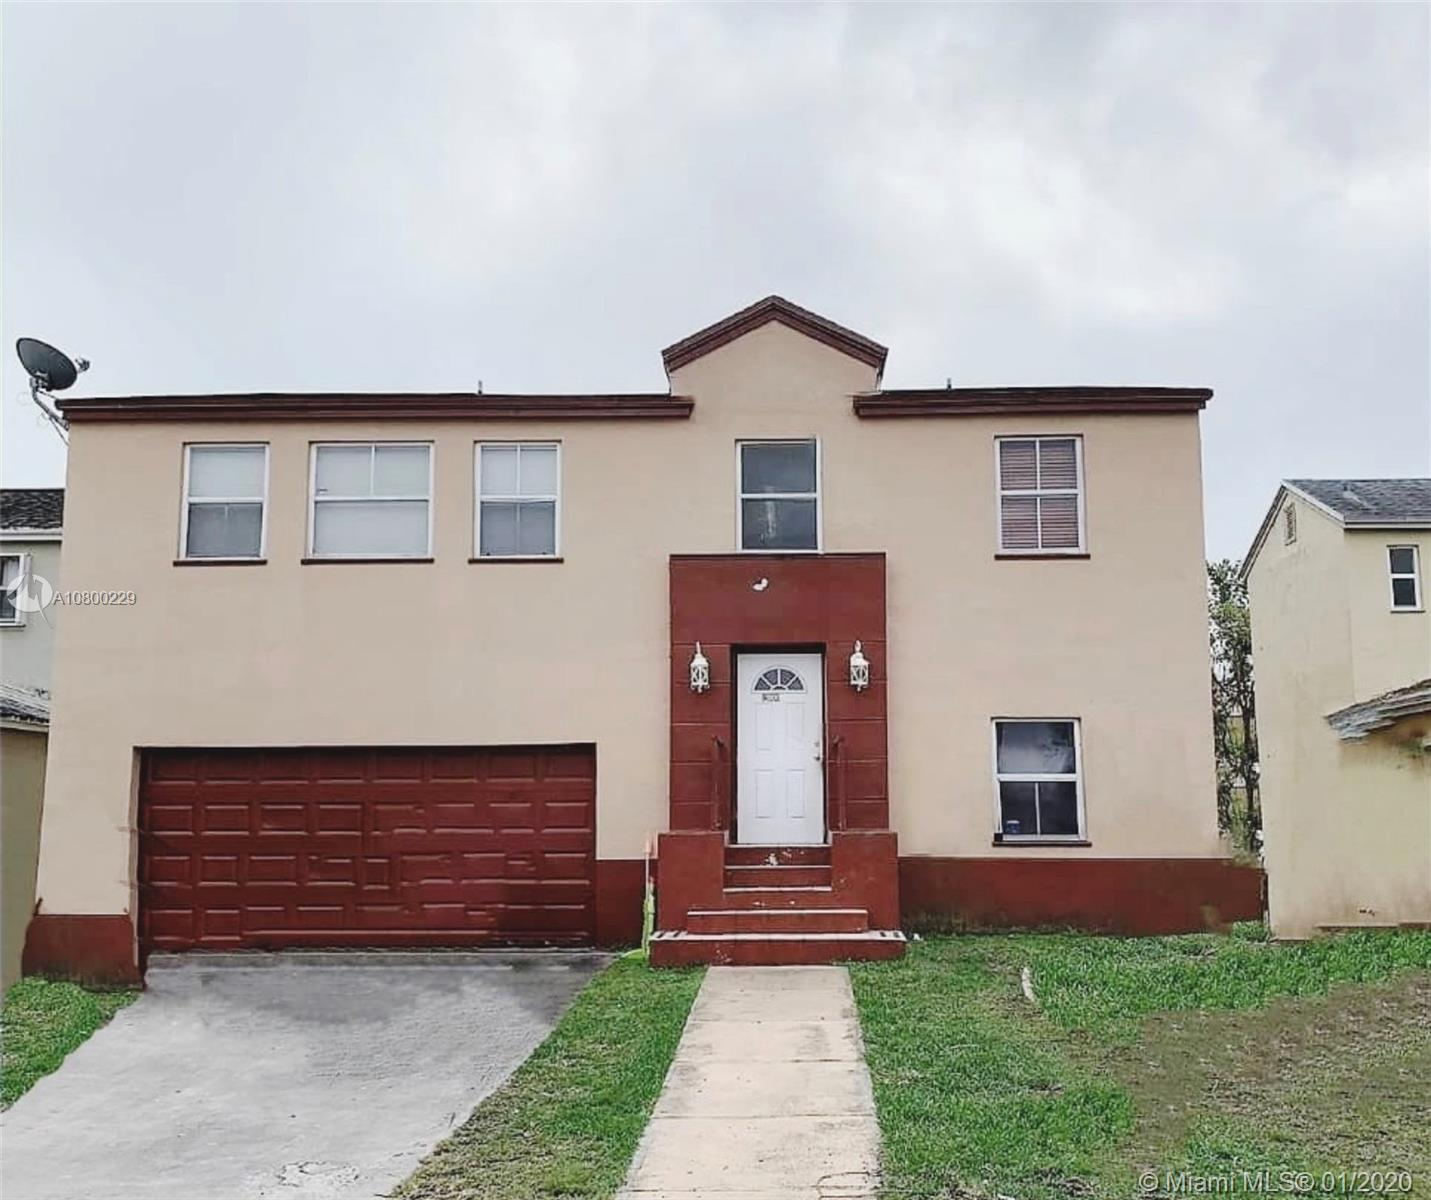 12000 SW 272nd Ter, Homestead, FL 33032 - Homestead, FL real estate listing